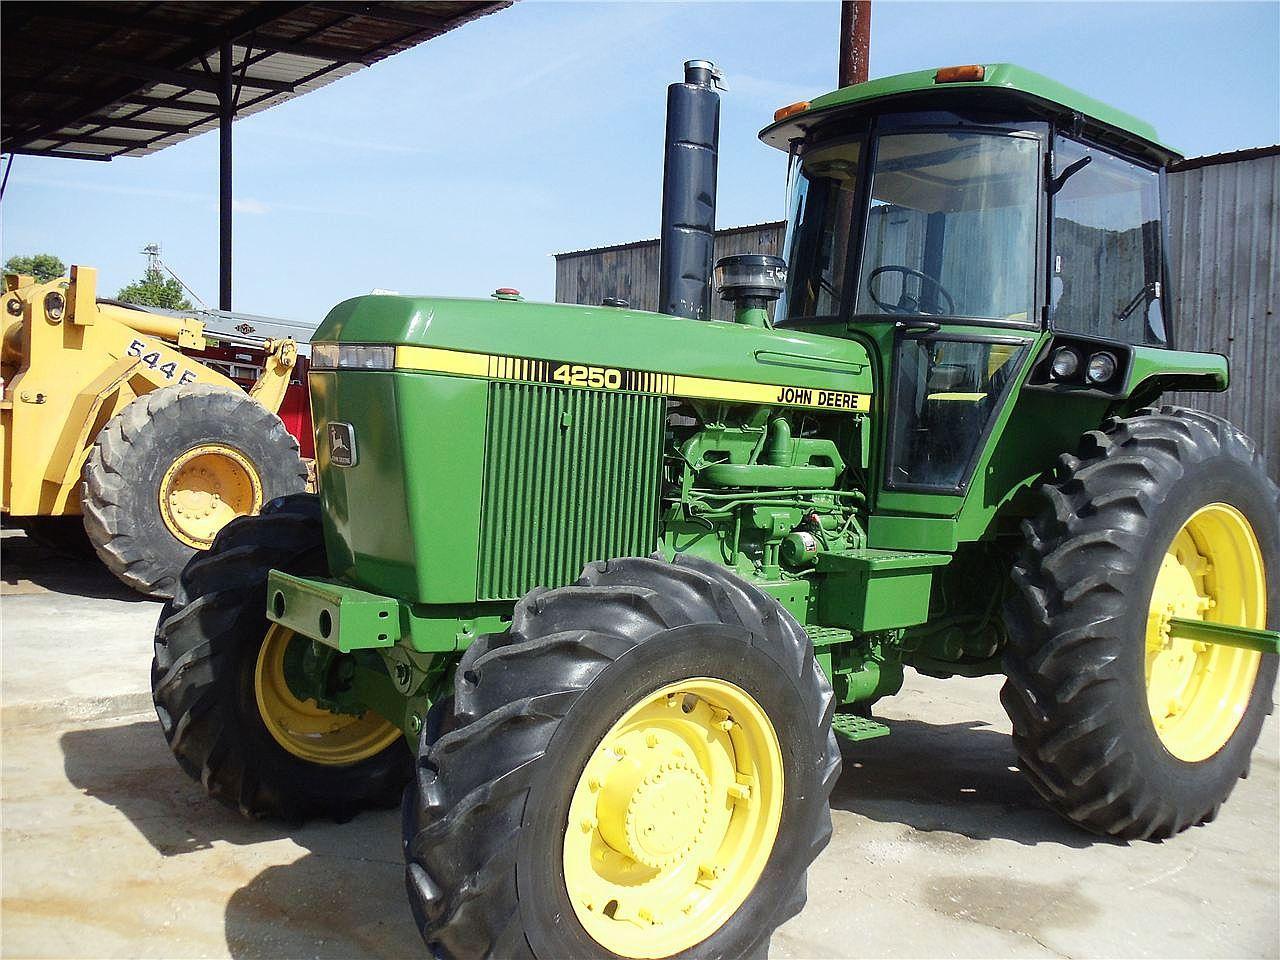 Buy john deere 100 hp to 174 hp tractors at tractorhouse com